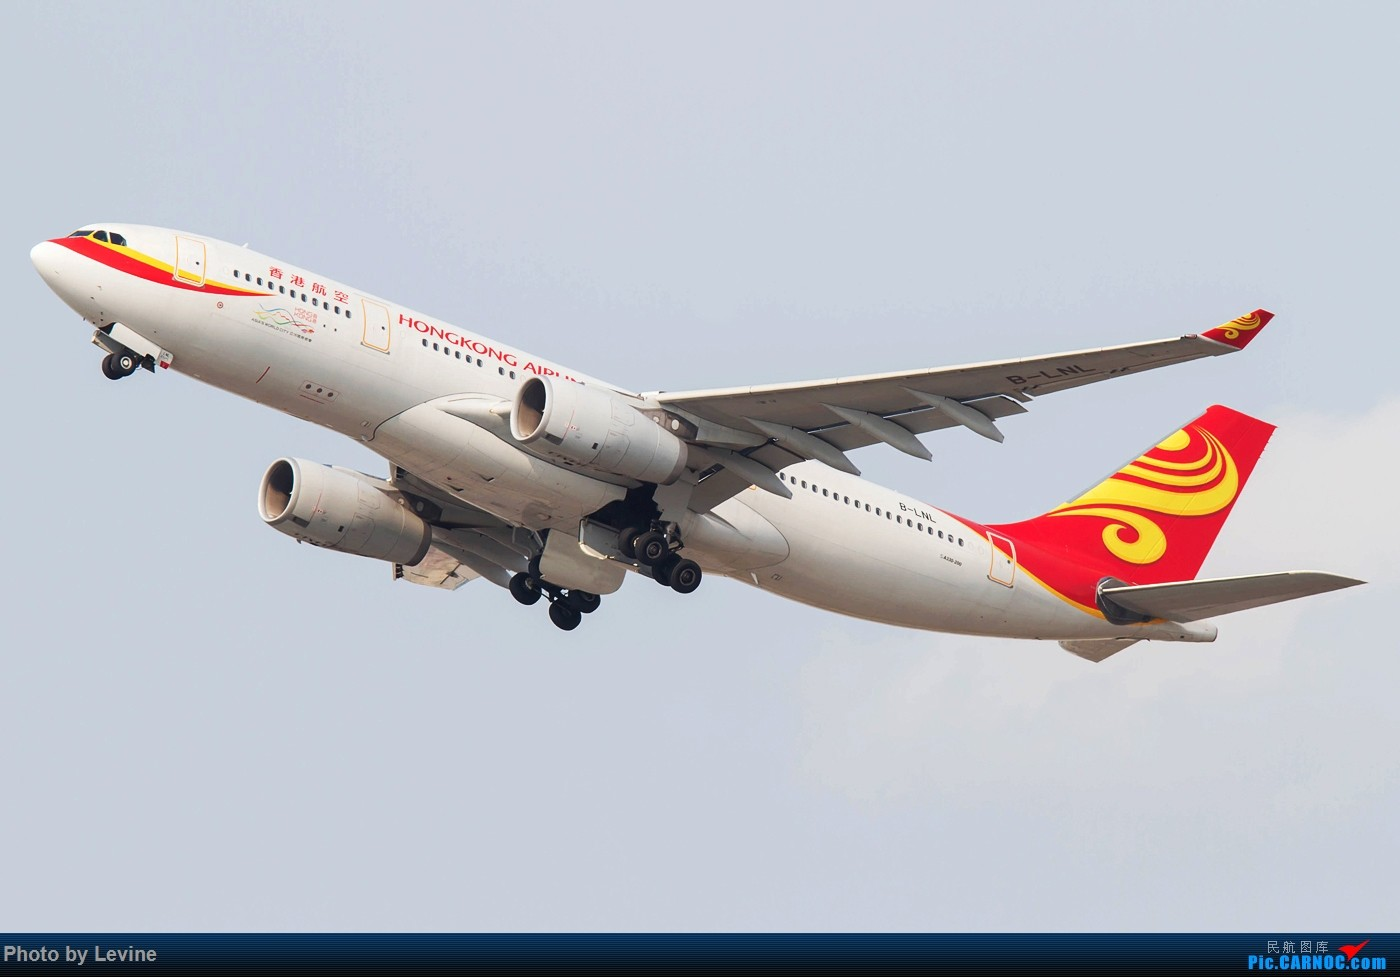 Re:[原创]今冬沙螺湾 迟来的图片 AIRBUS A330-200 B-LNL 中国香港国际机场